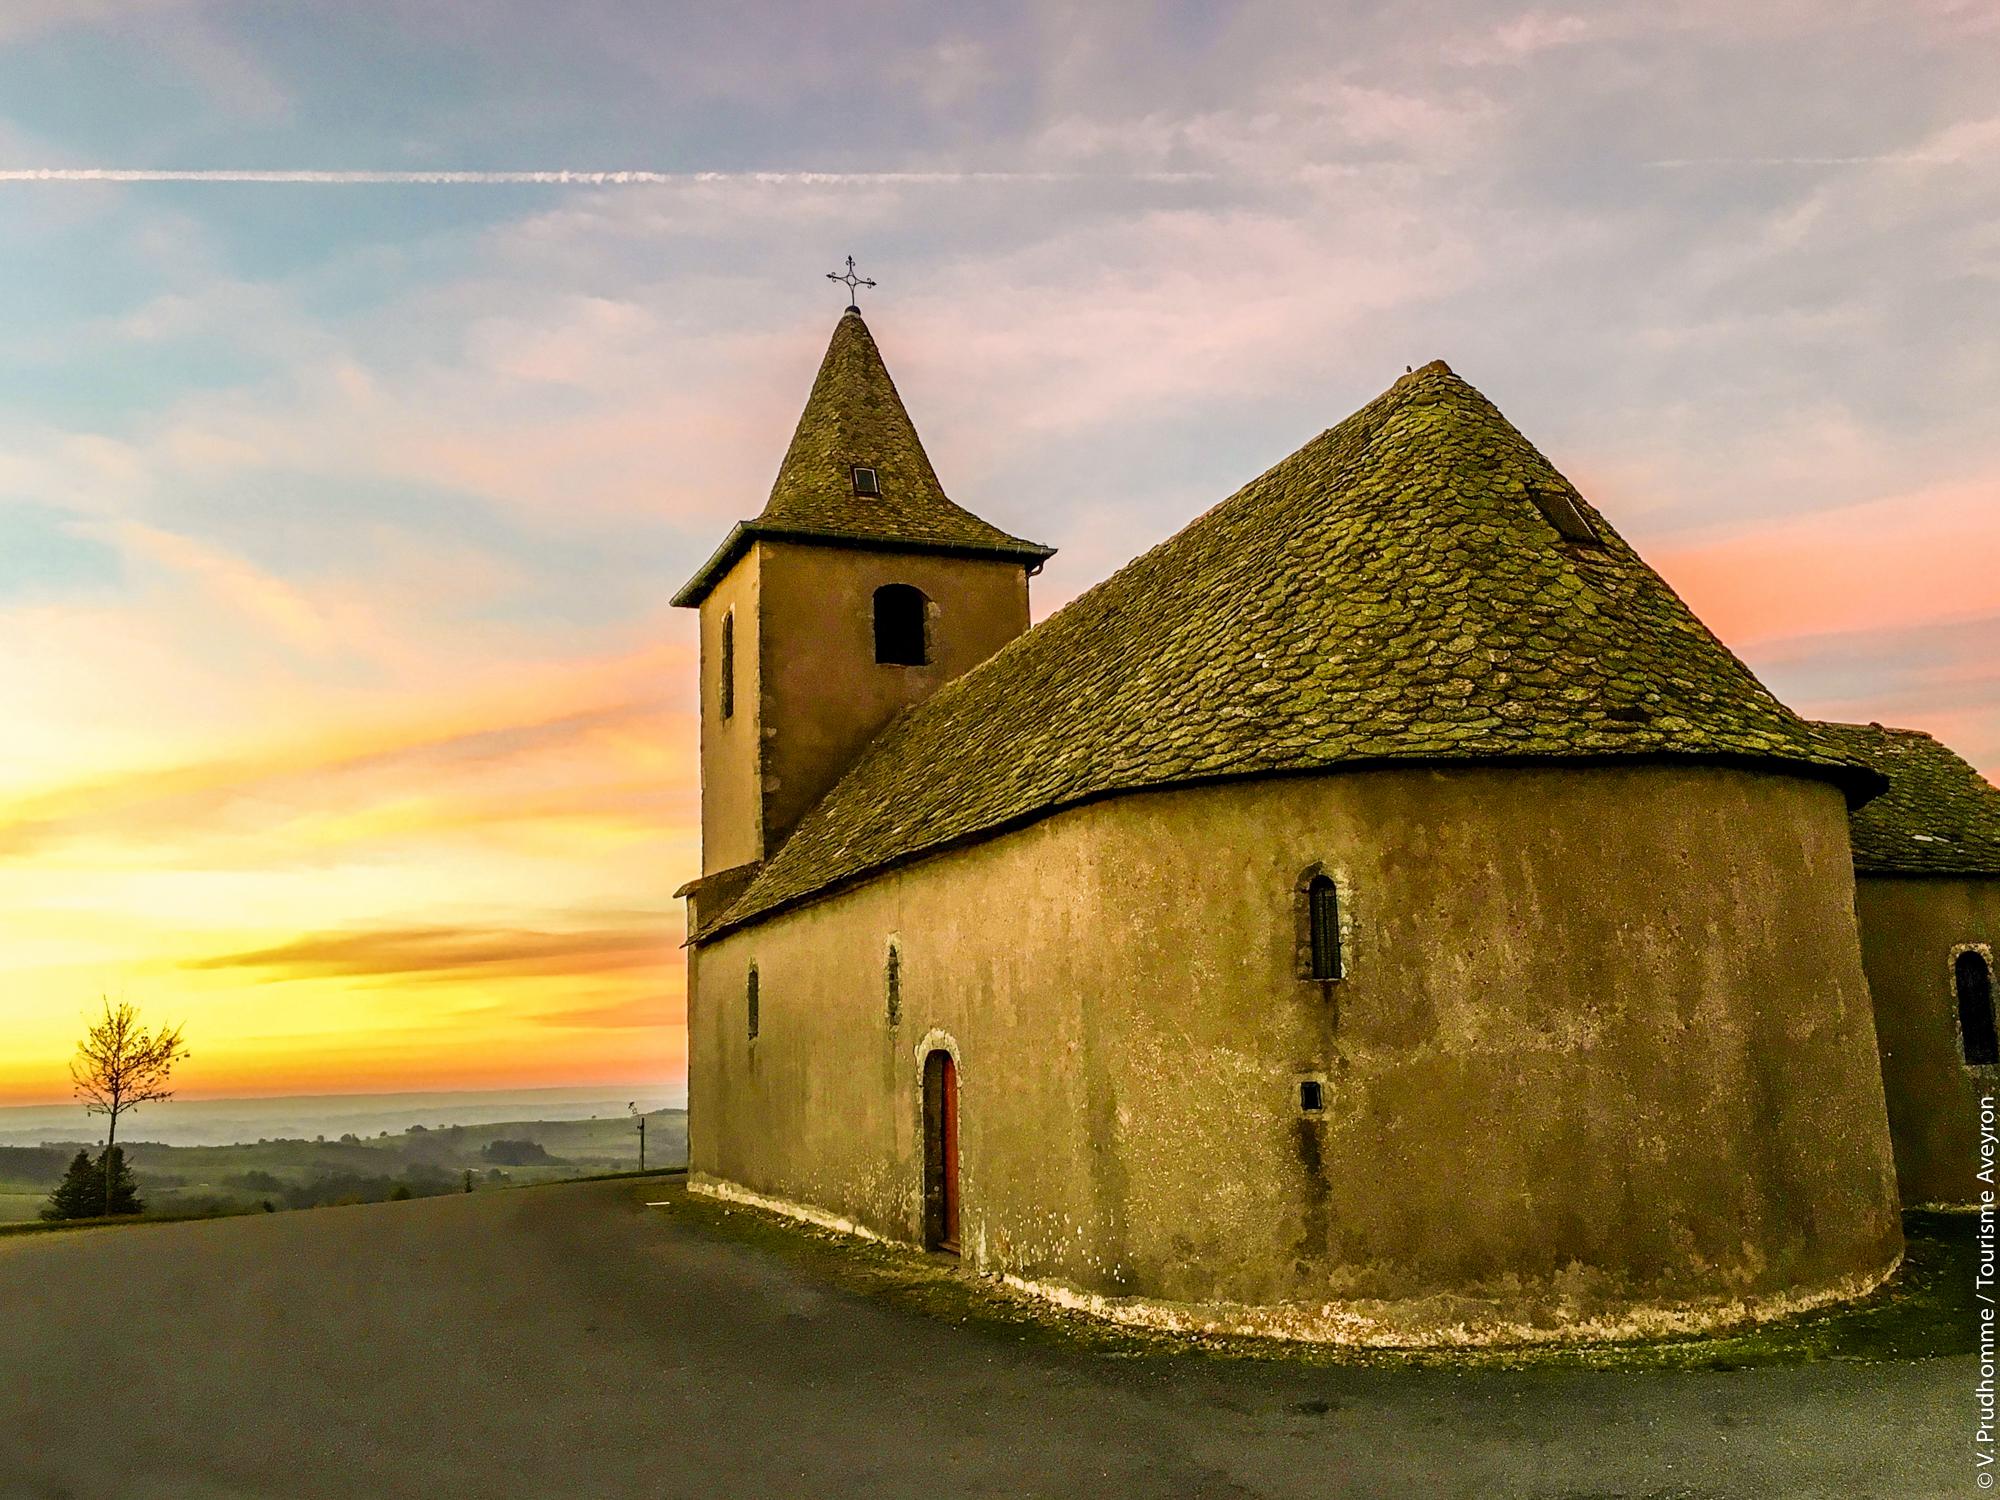 Chapelle de Rieupeyroux © V. Prudhomme - Tourisme Aveyron